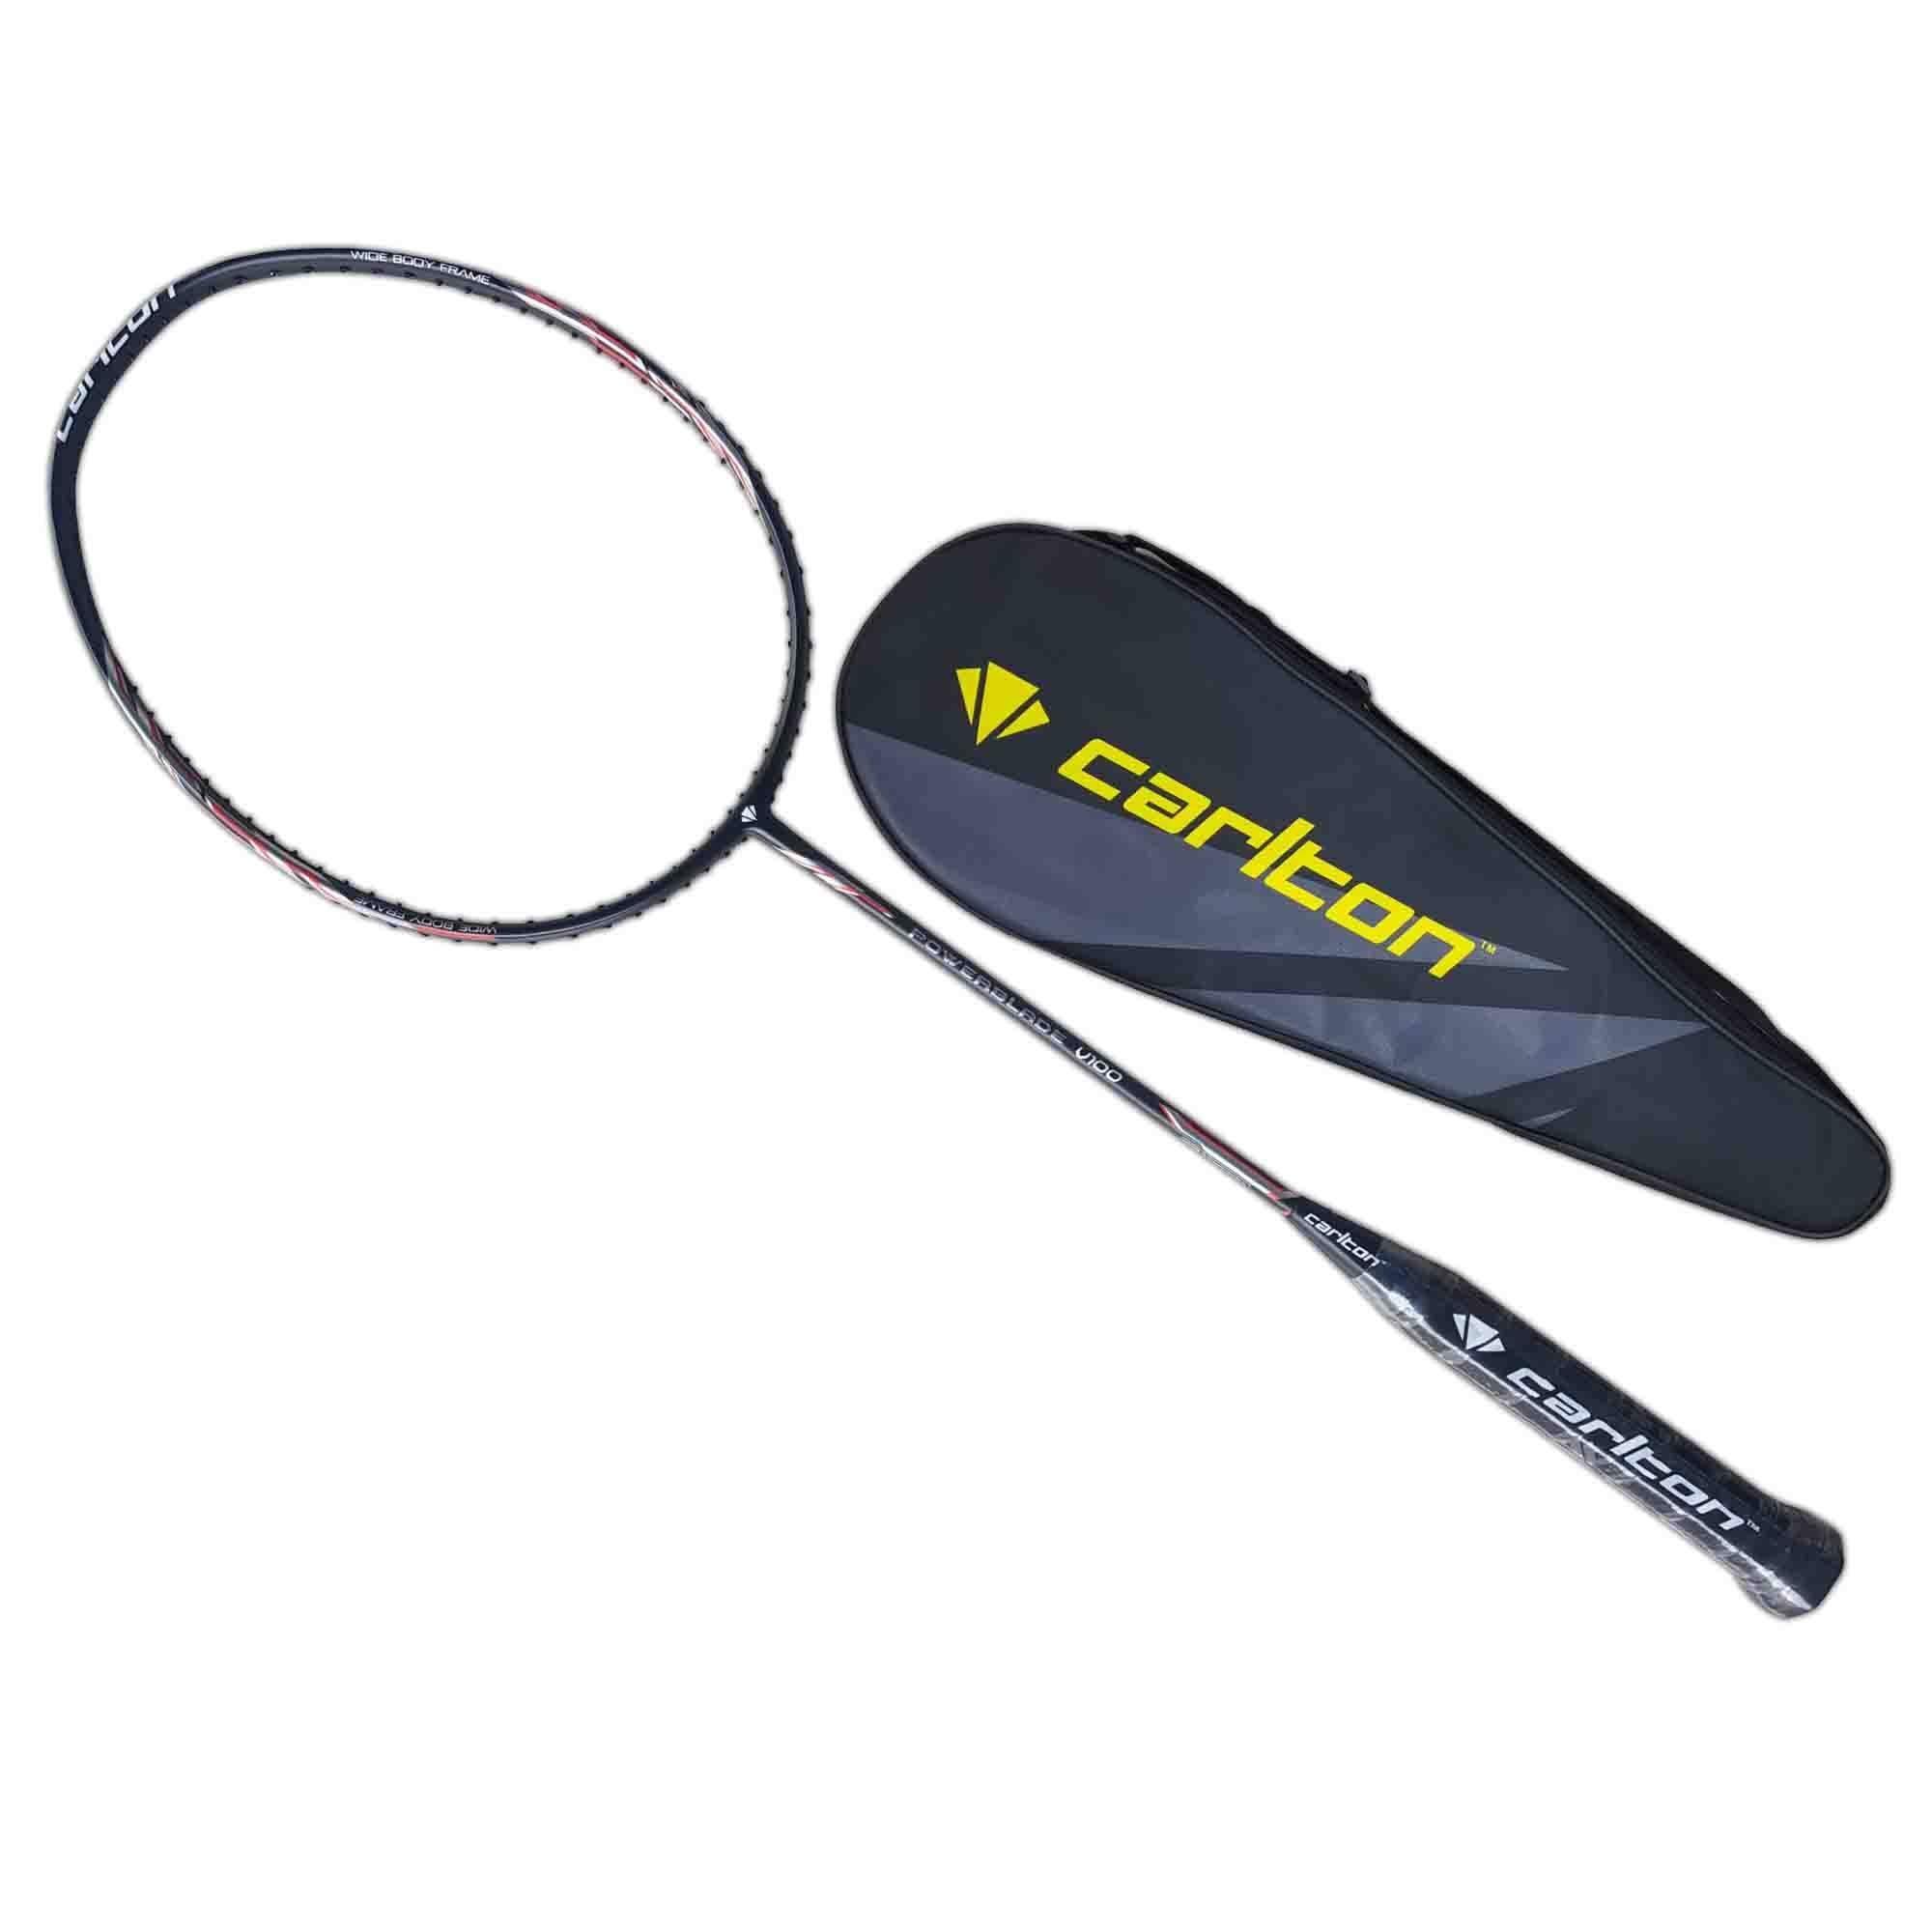 Carlton Badminton Racket PowerBlade V100